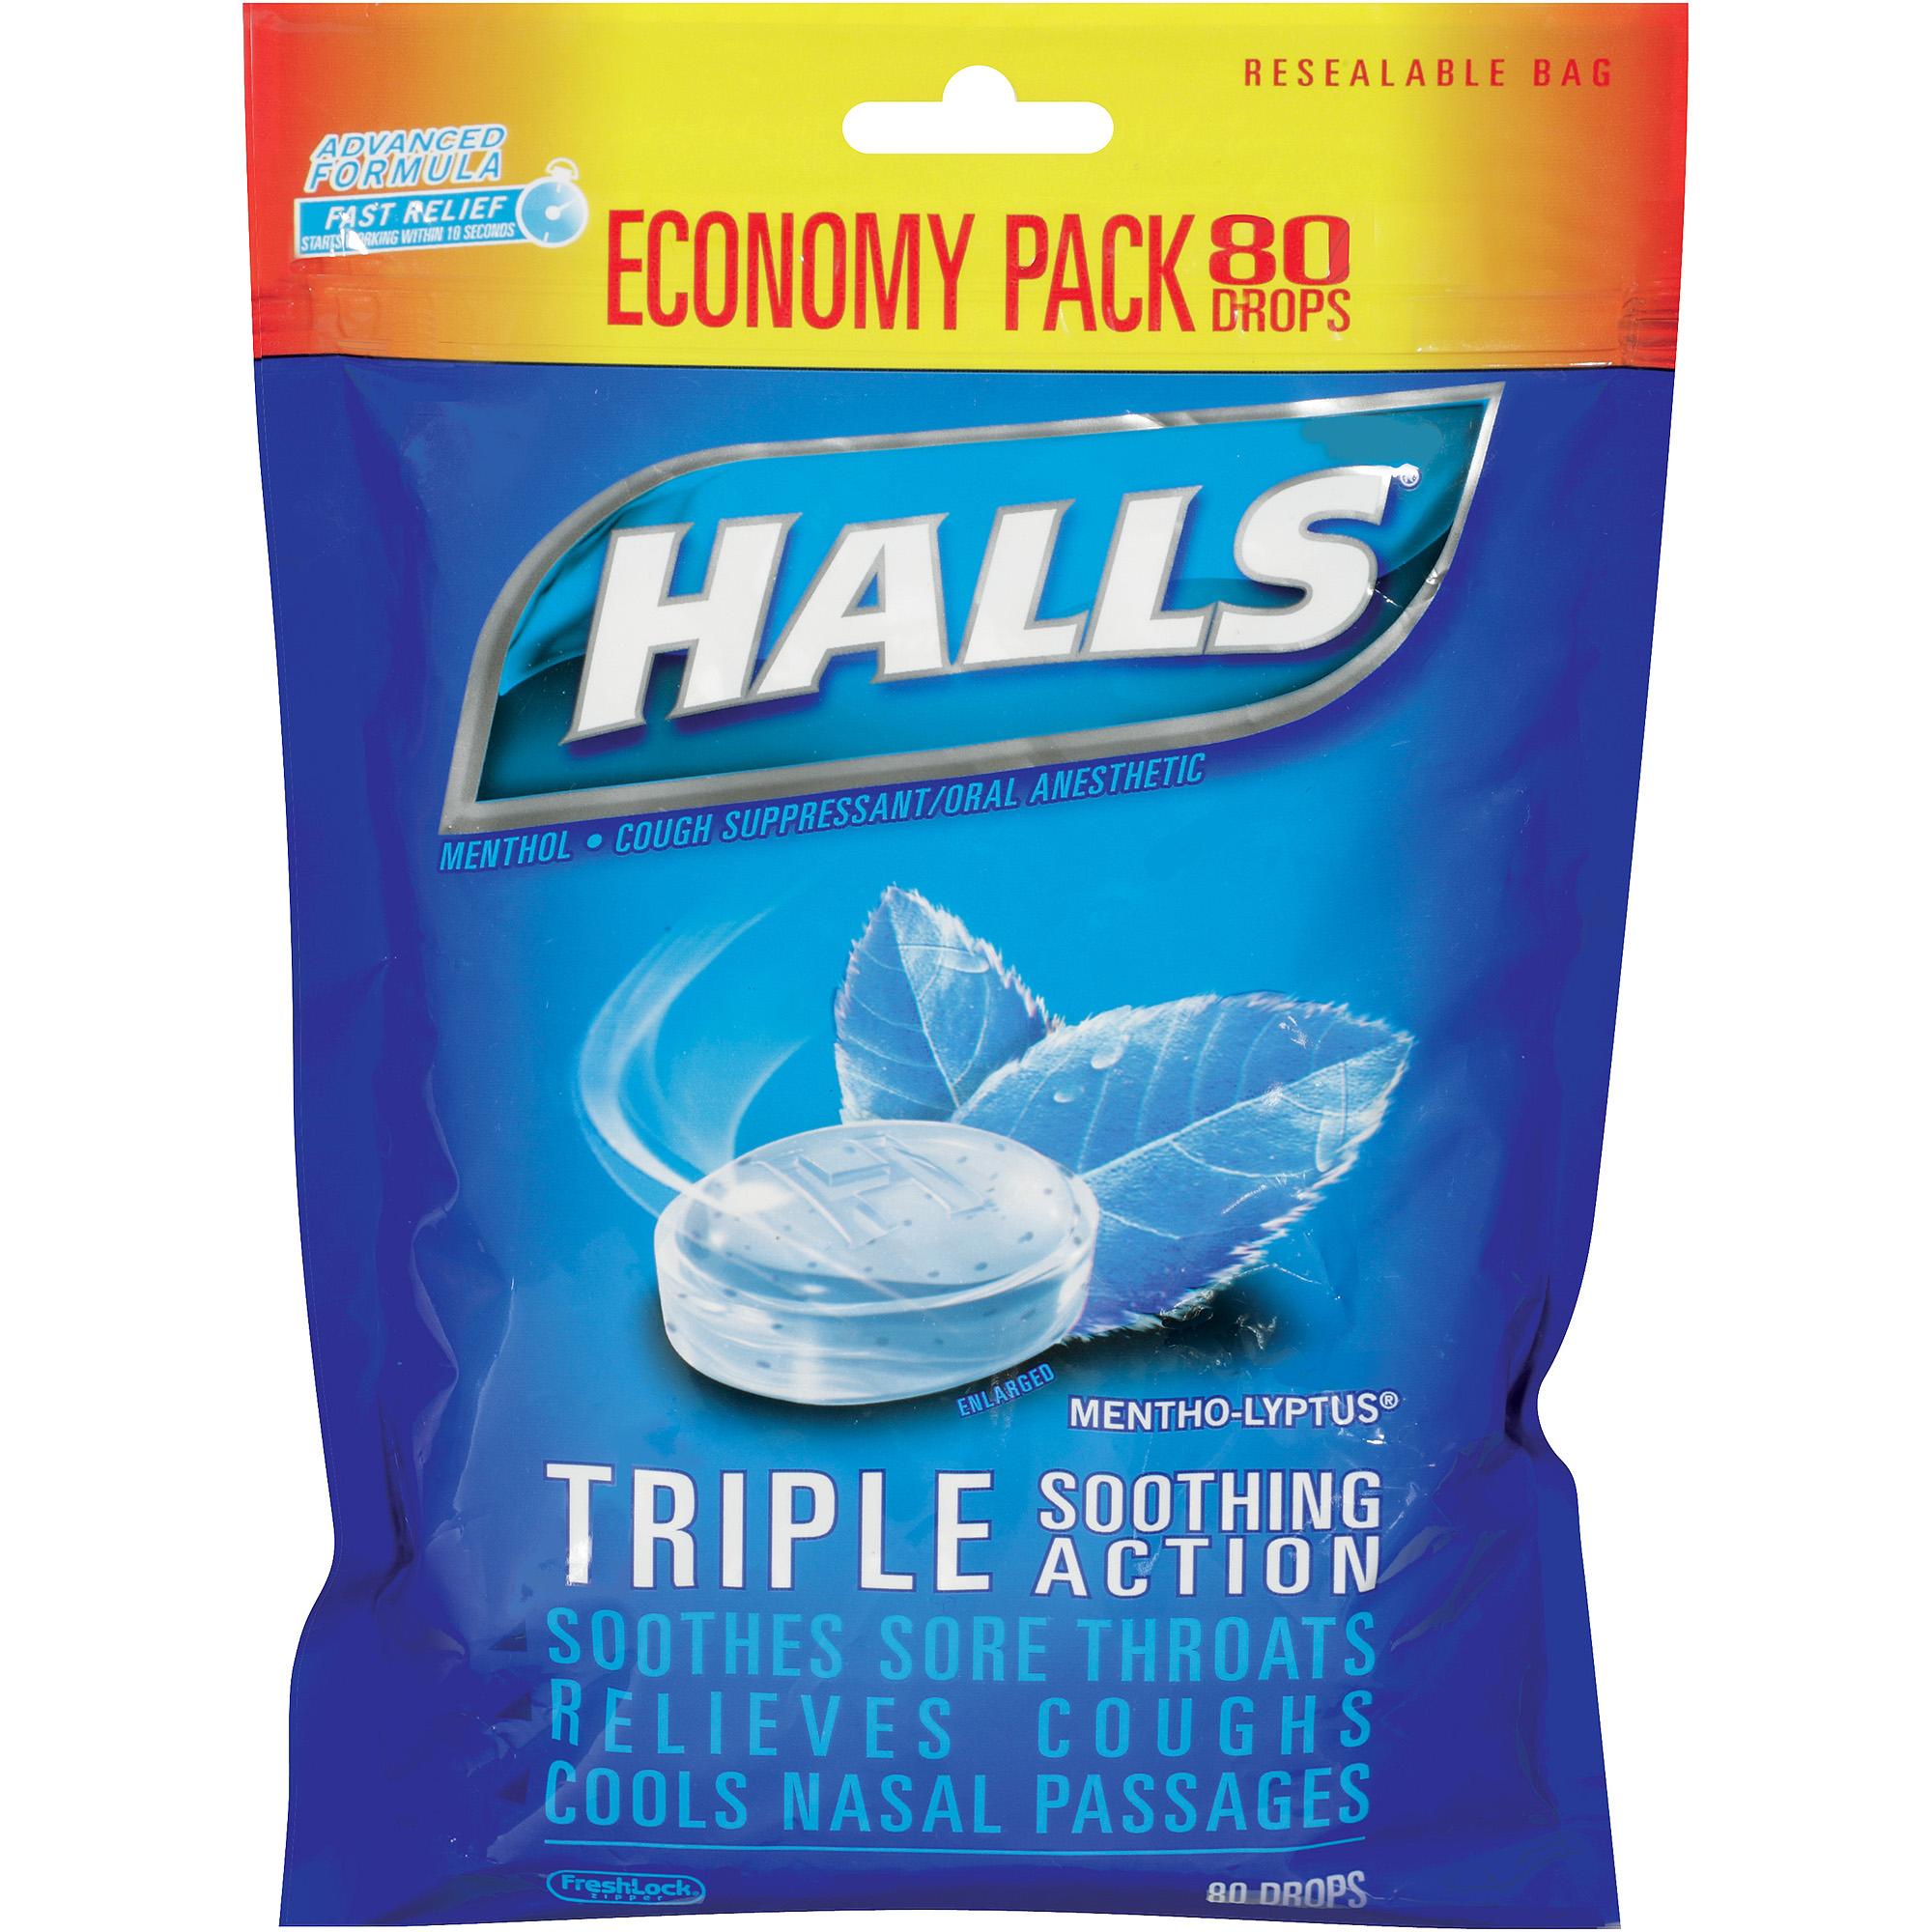 Halls Mentho-Lyptus Menthol Drops Cough Suppressant, 80 count